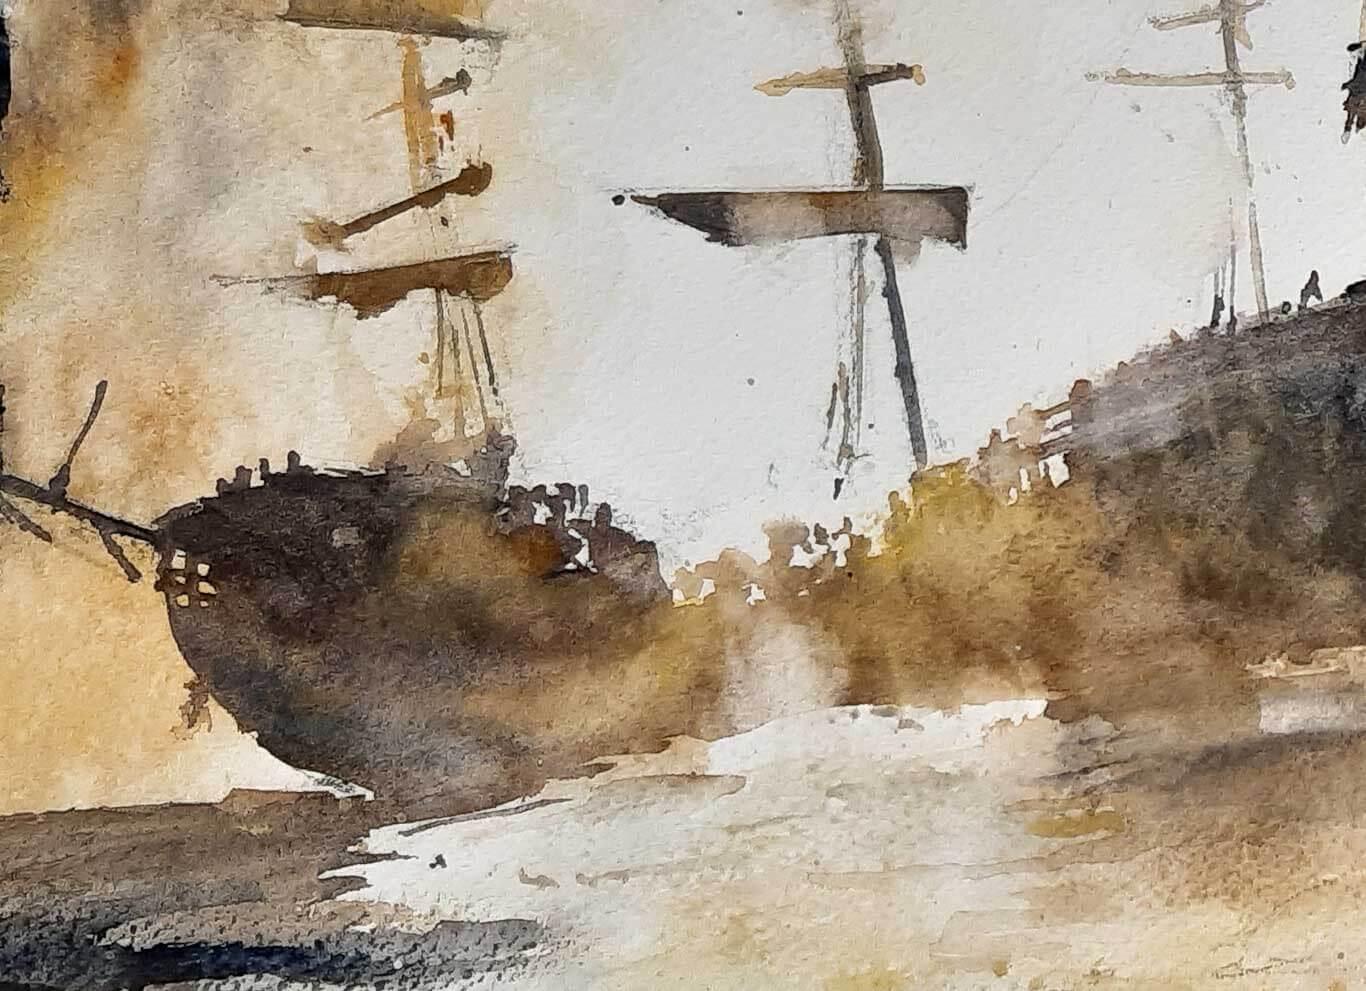 Sailing ship series - Emmanuele Cammarano watercolor artist - Acquerellista